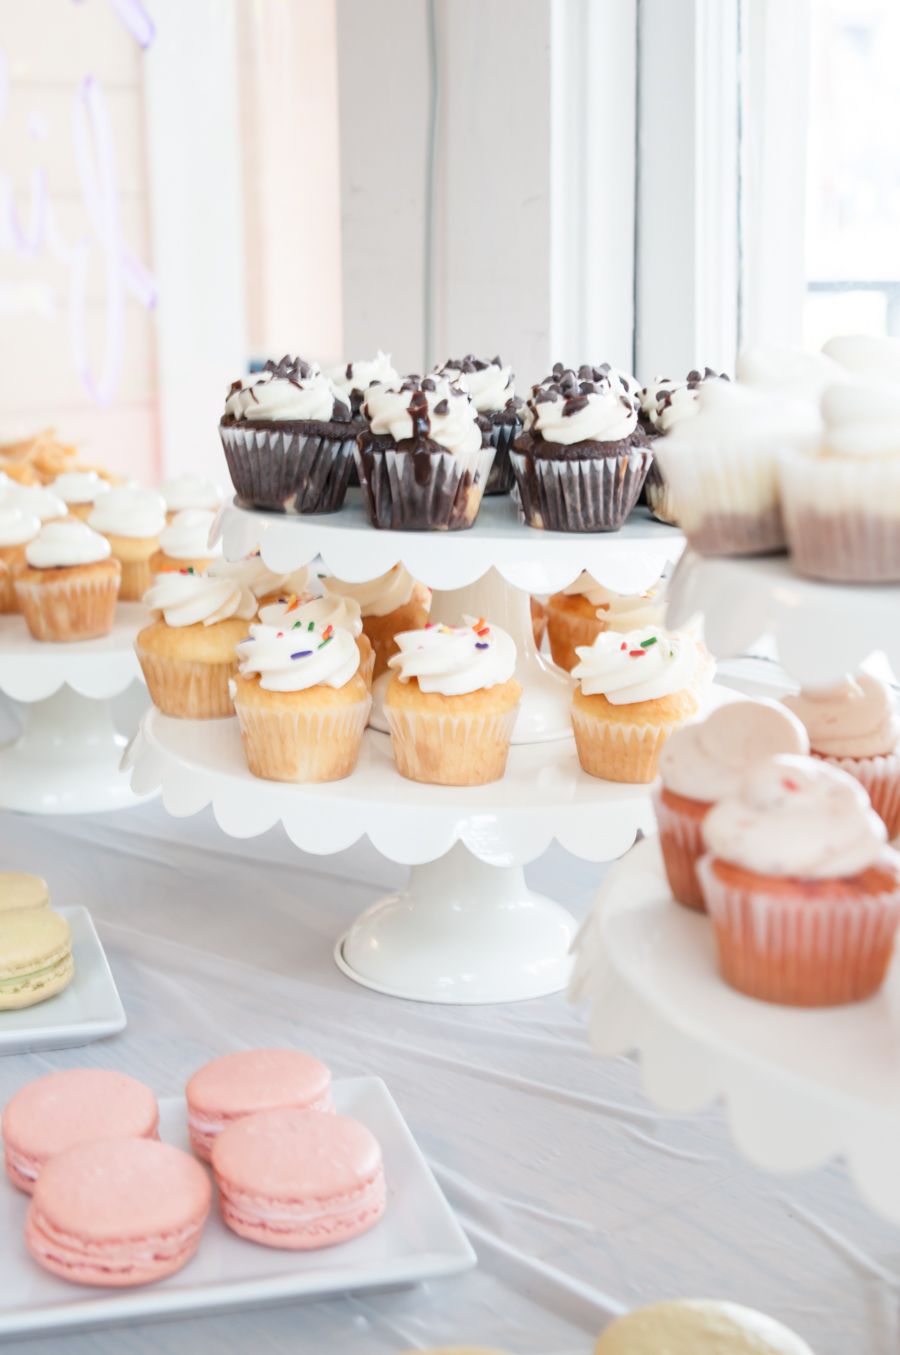 Polkadots Cupcake Factory Makes My Favorite Cupcakes in Austin